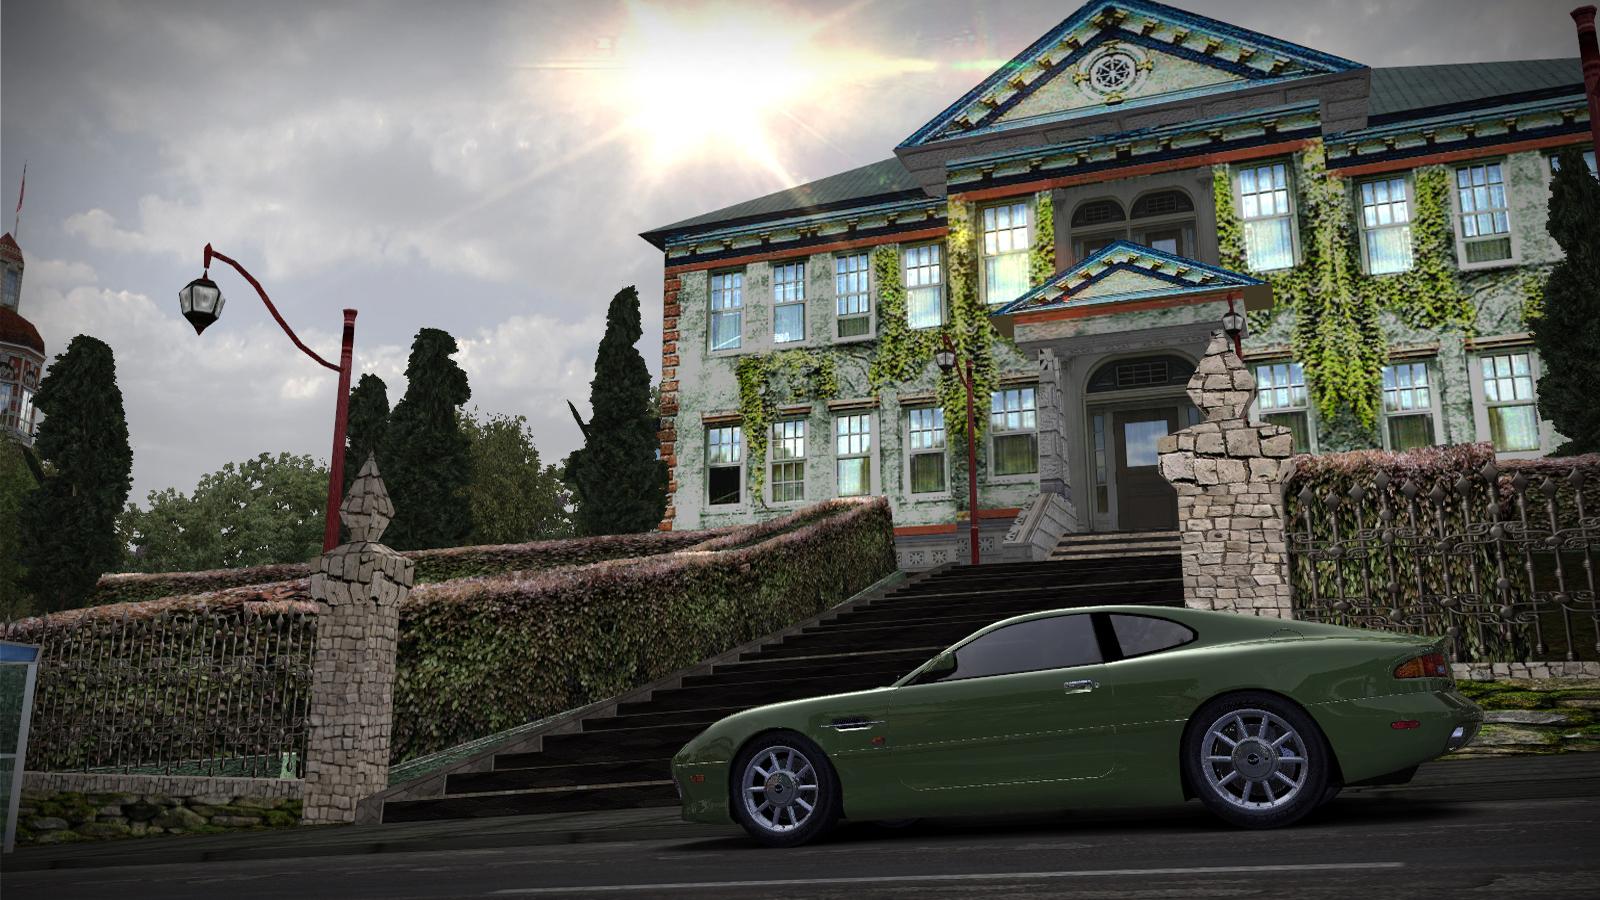 Speed 2020-01-05 19-02-35-096.jpg - Need for Speed: Most Wanted (2005) Aston Martin DB7 Vantage, Автомобиль